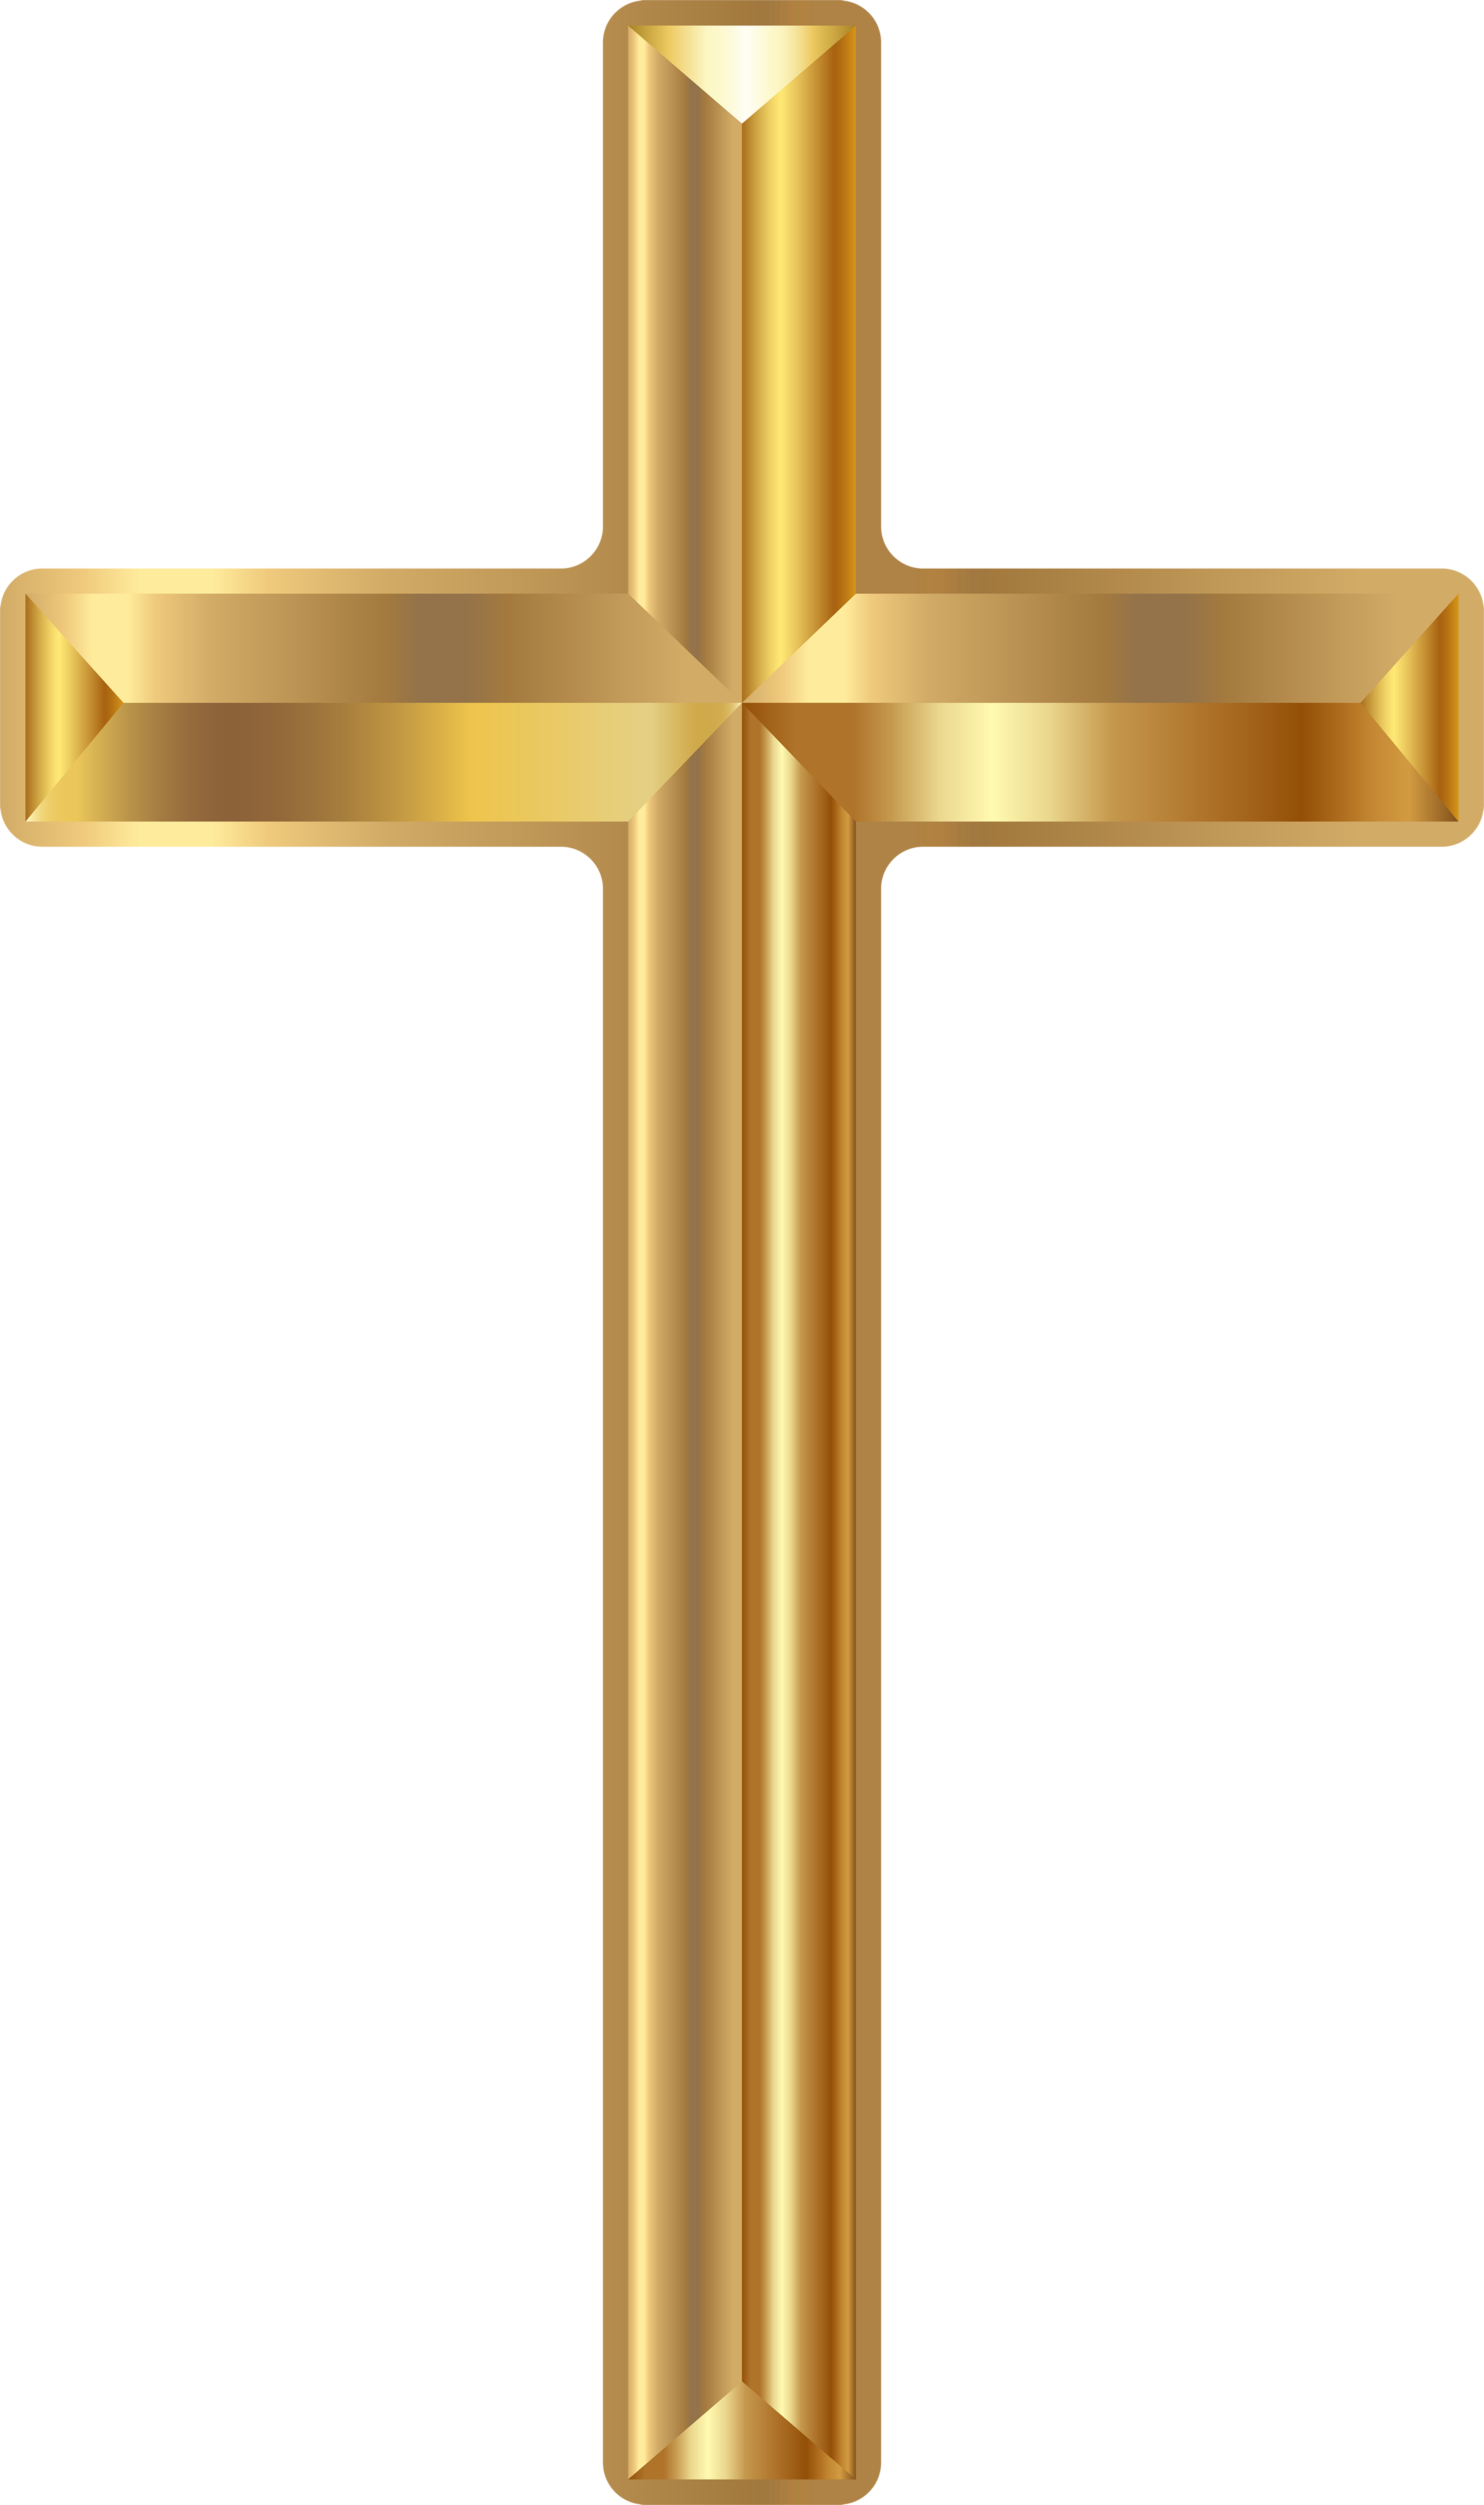 Christian PNG HD Crosses Transparent Christian HD Crosses.PNG Images.